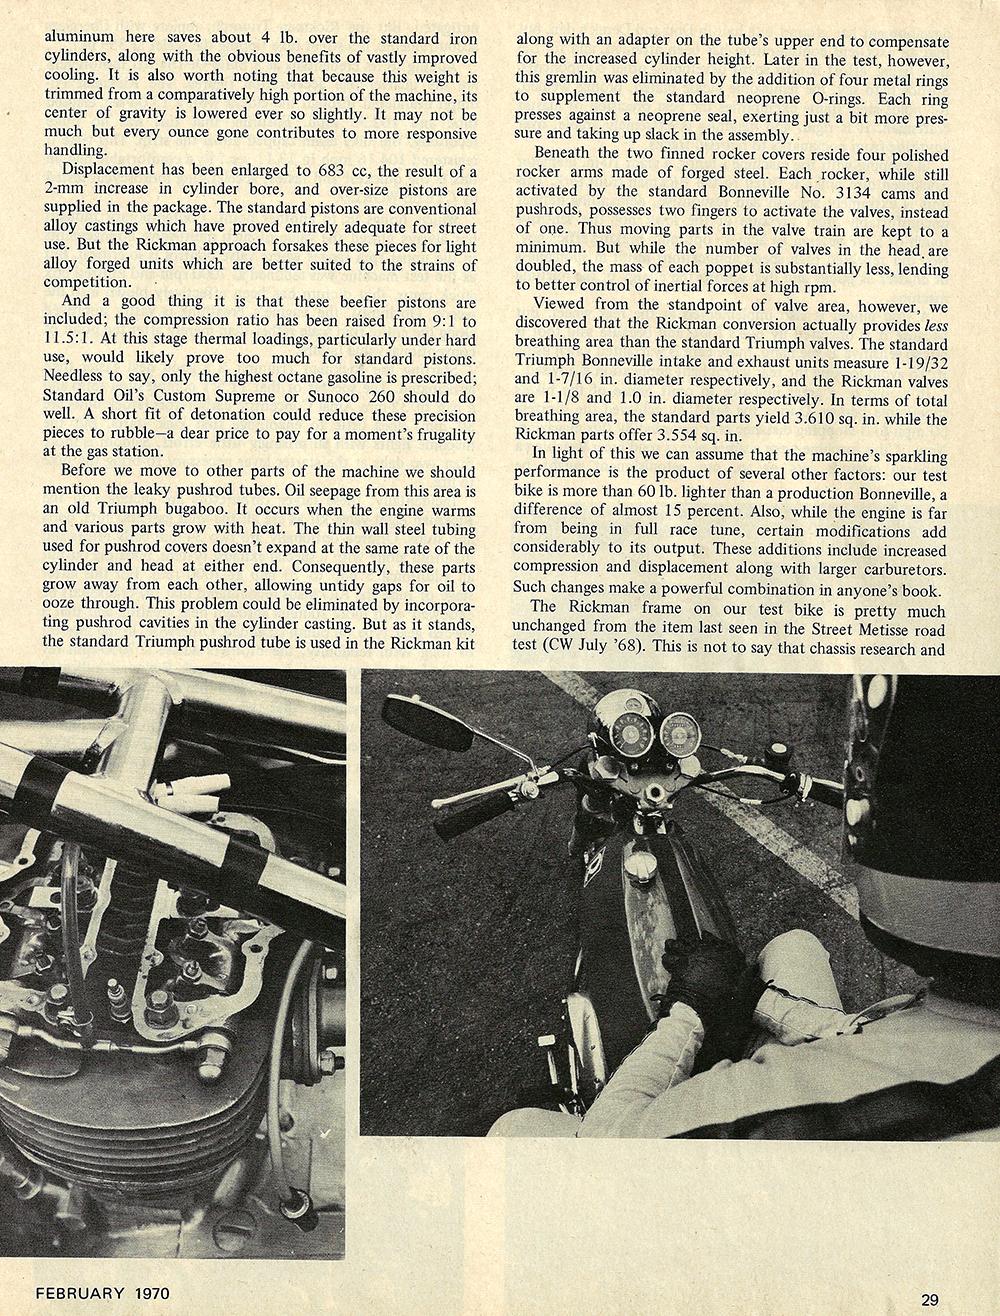 1970 Rickman 8 valve Triumph road test 02.jpg